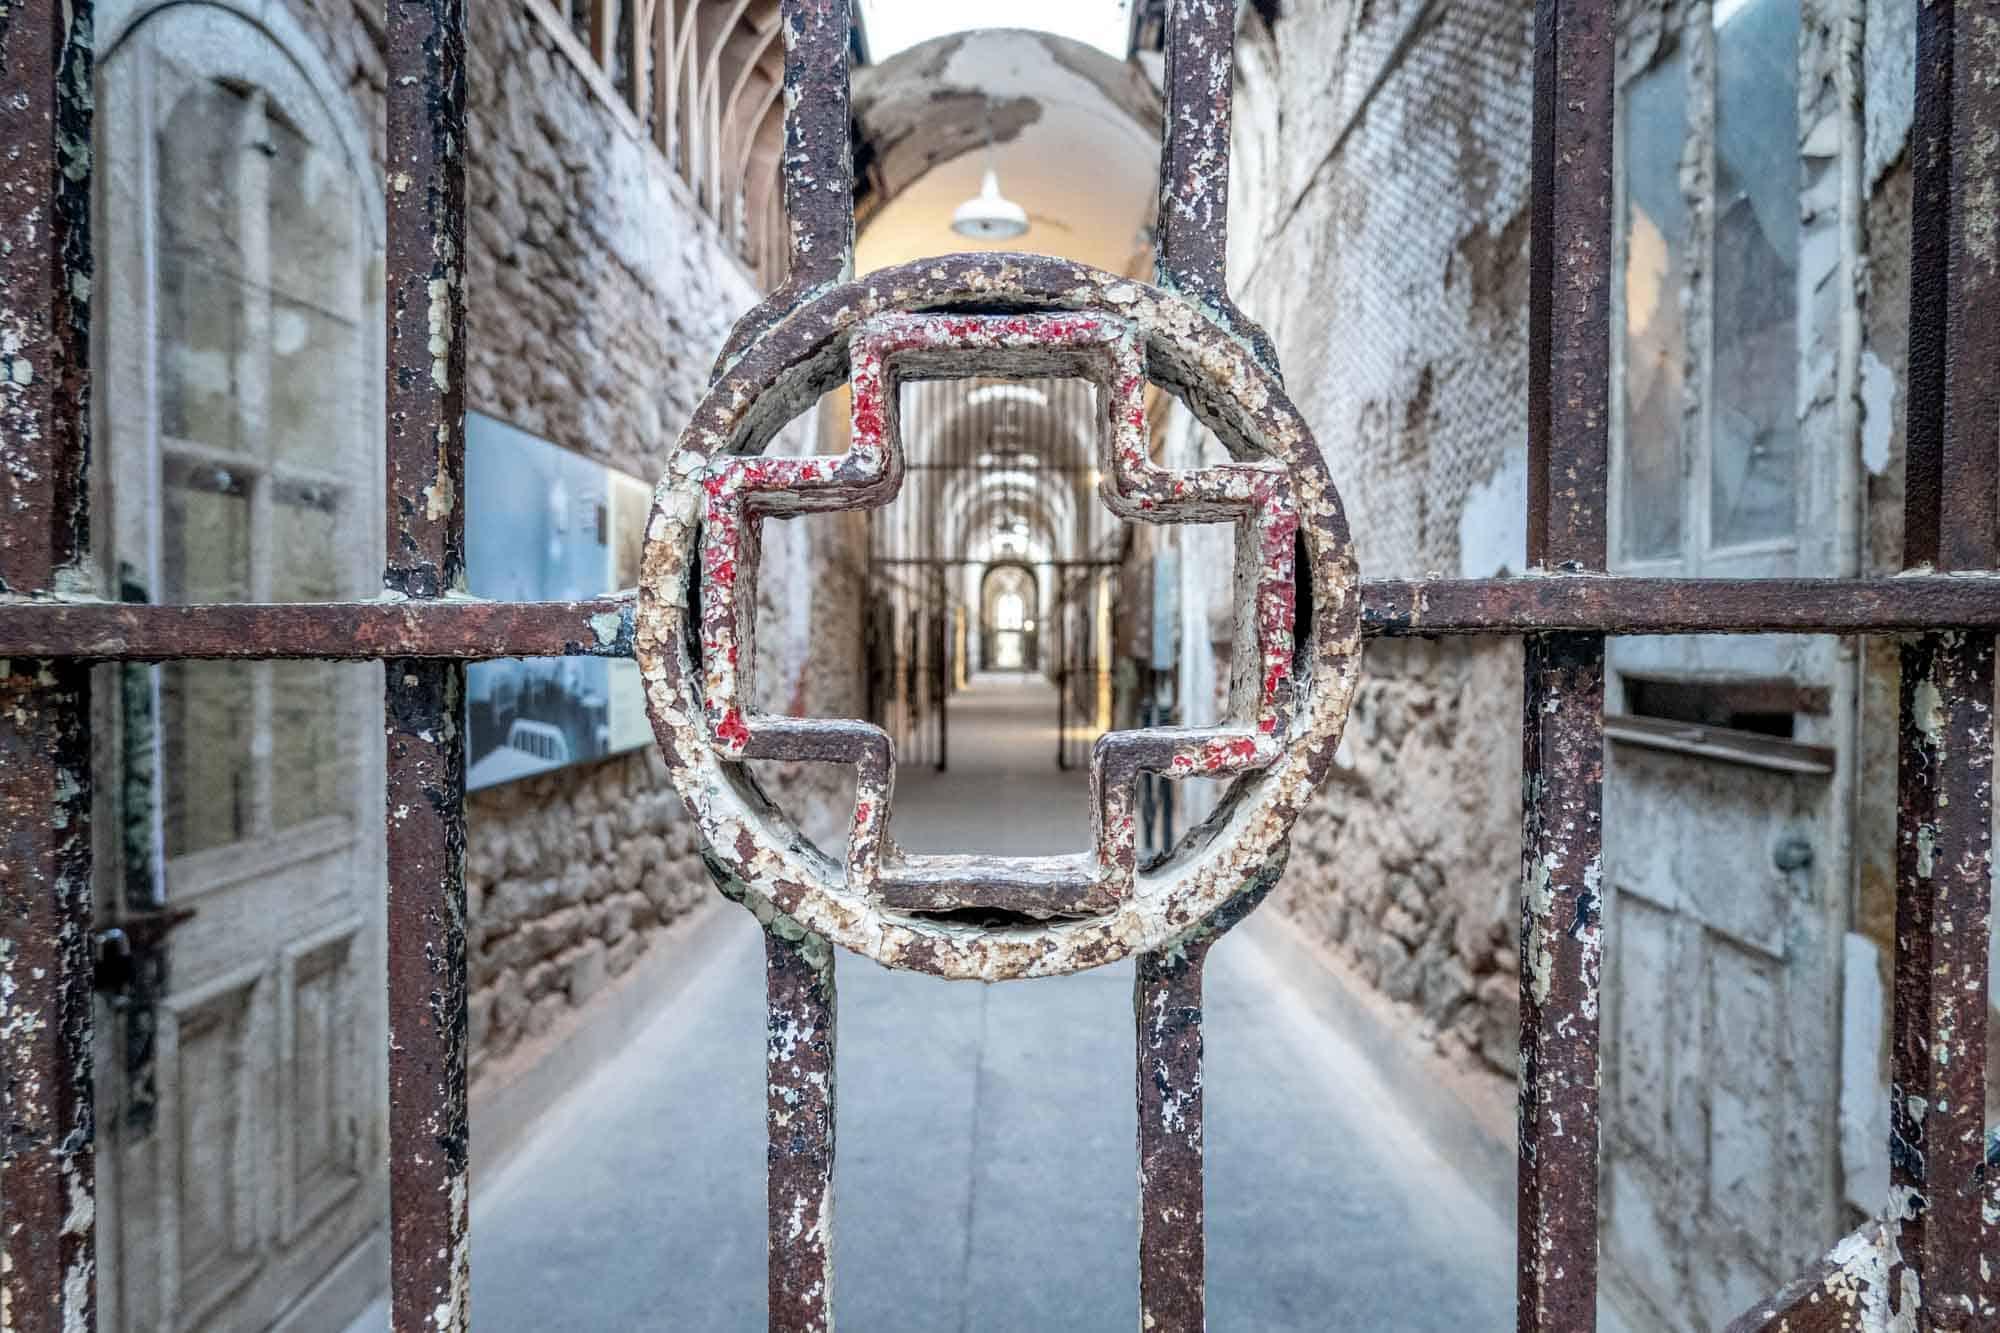 Medical cross in prison cell bars